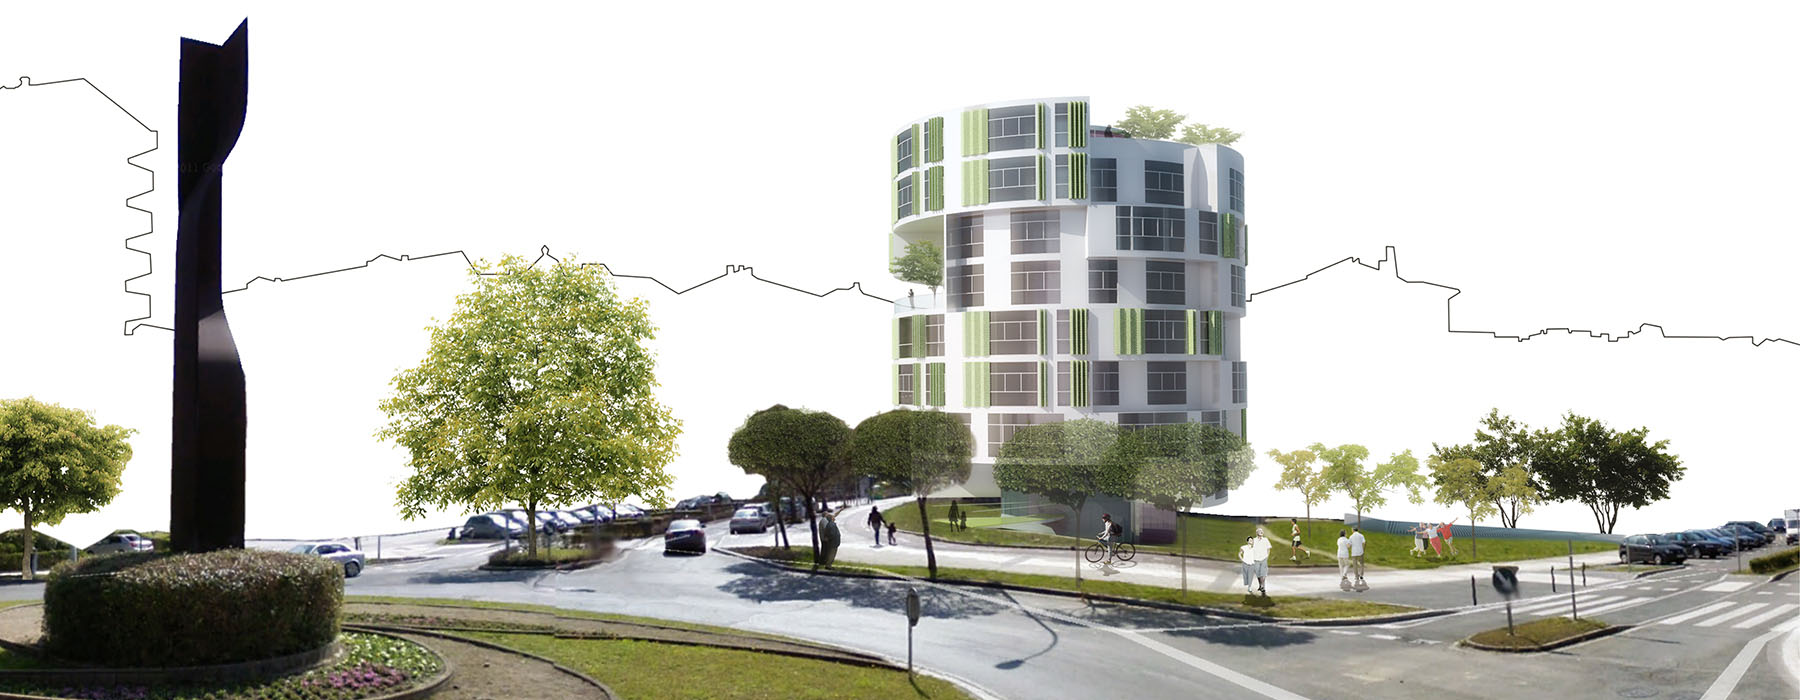 Edificio de Apartamentos para Mayores. Intxaurrondo.